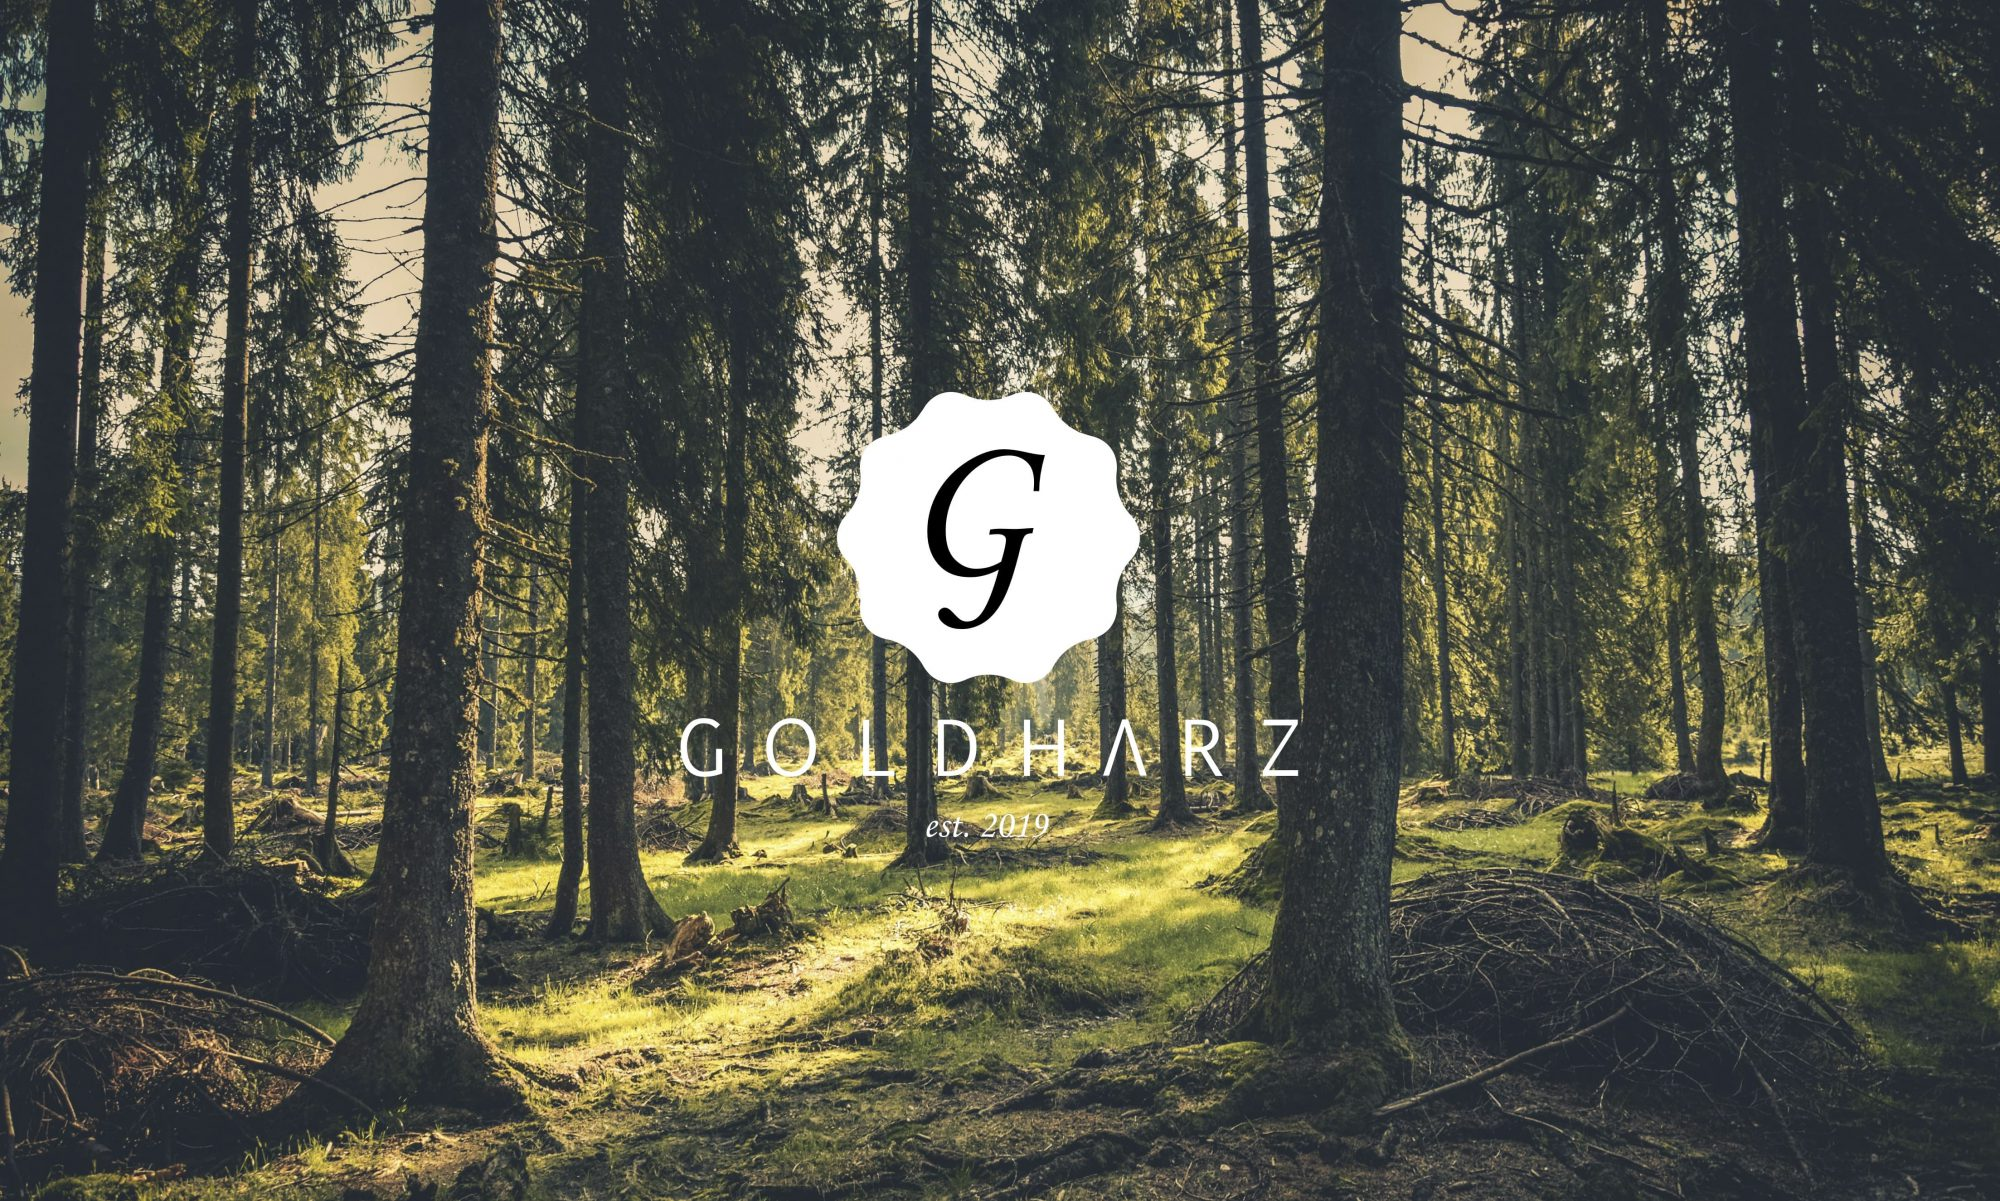 Goldharz